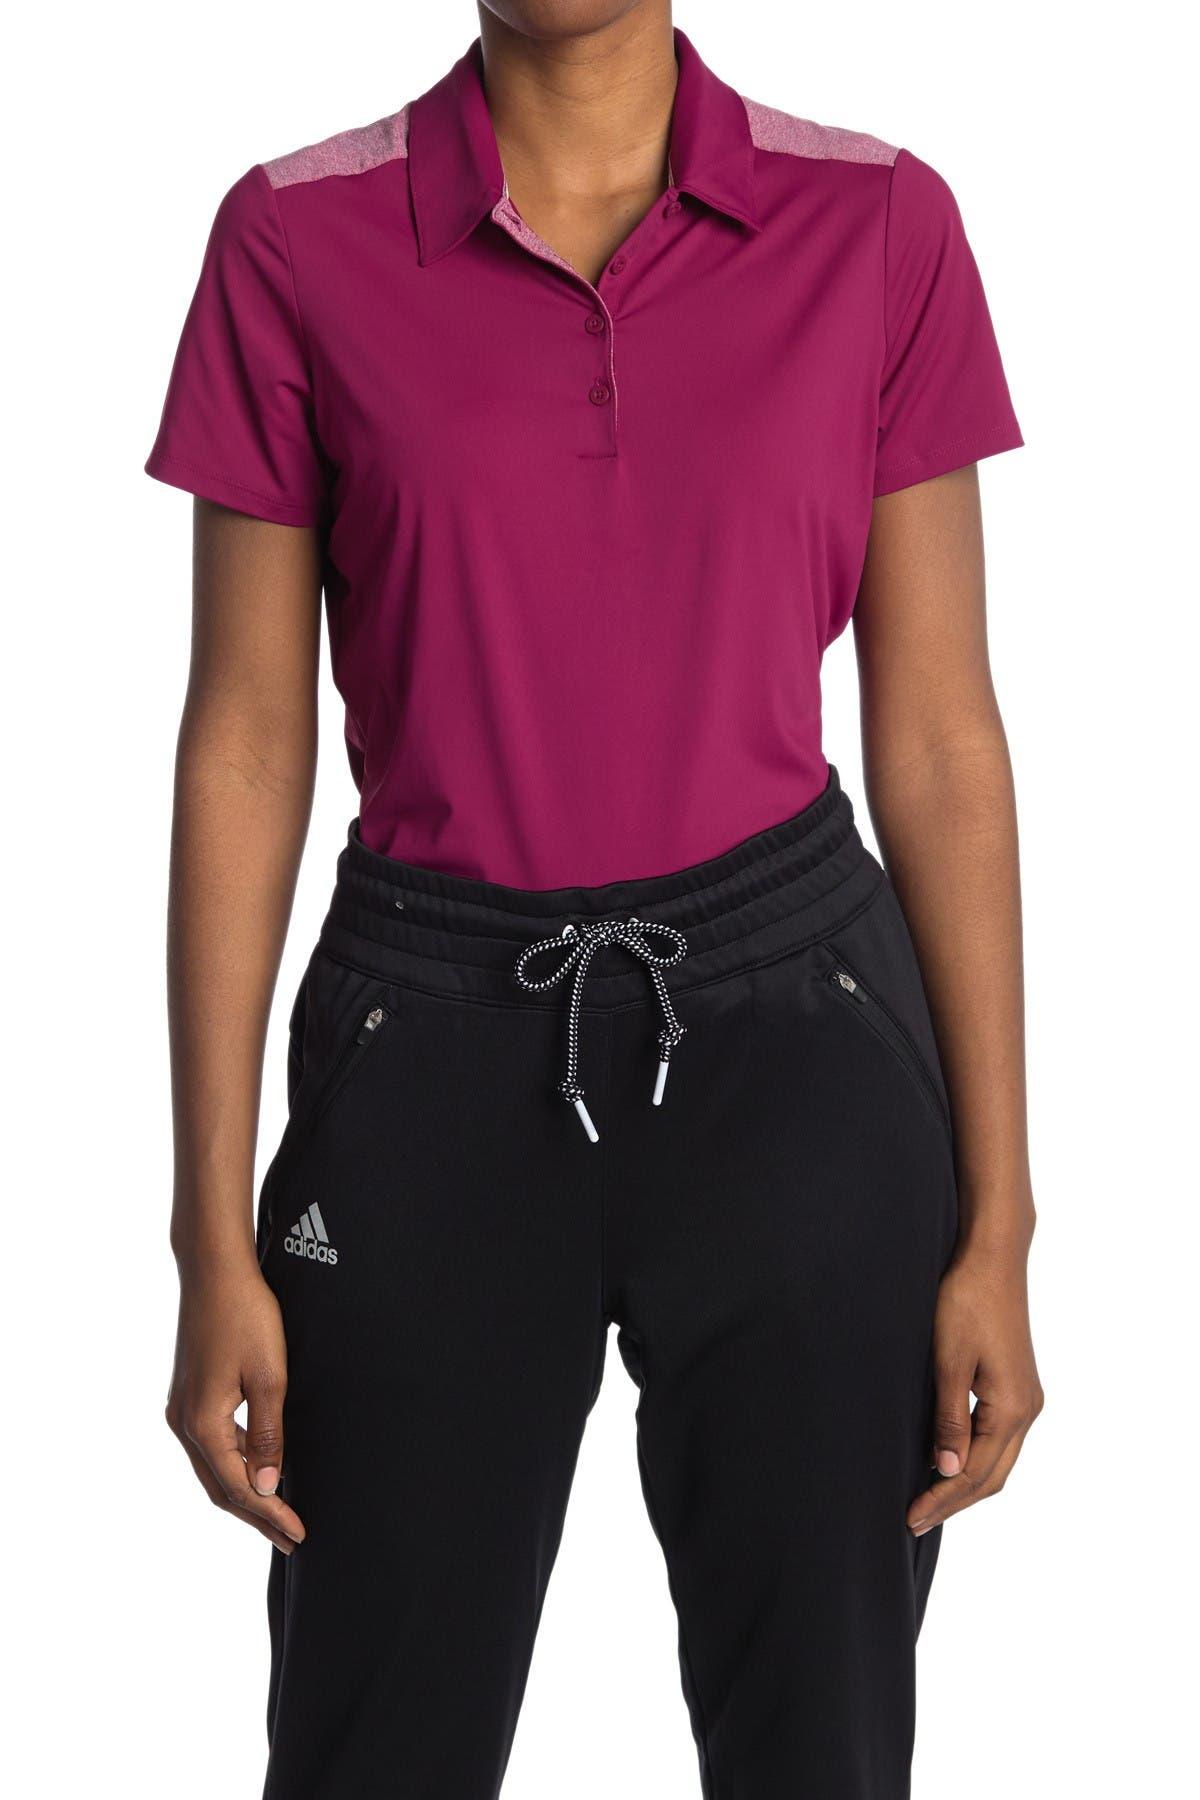 Image of Adidas Golf Ultimate 365 Short Sleeve Polo